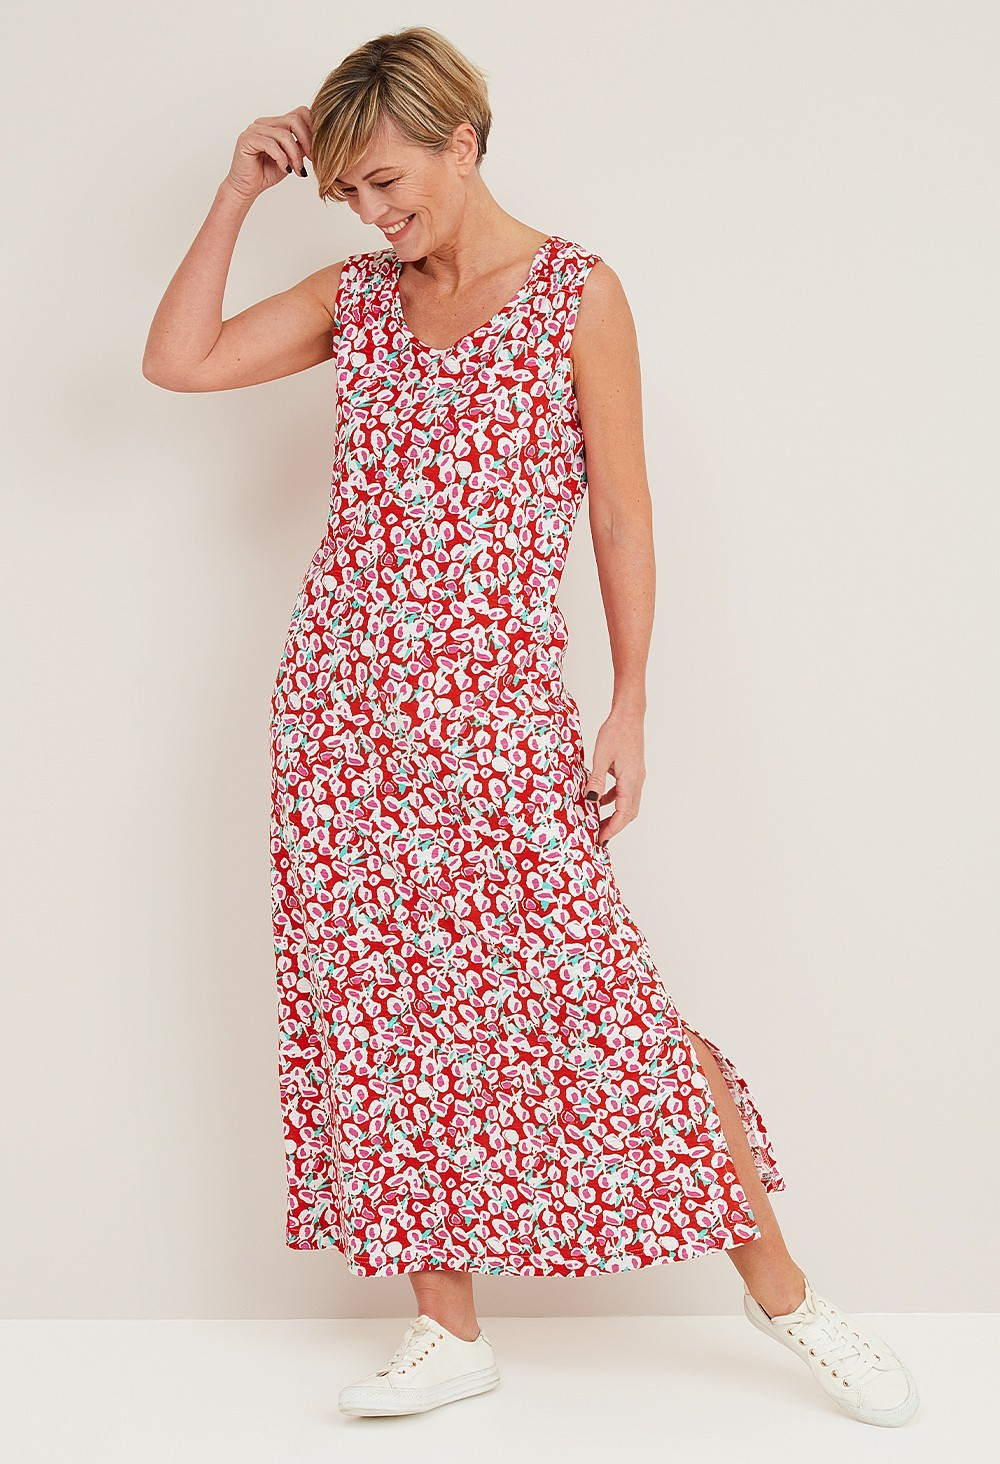 Adele Lollipop Print Dress main image